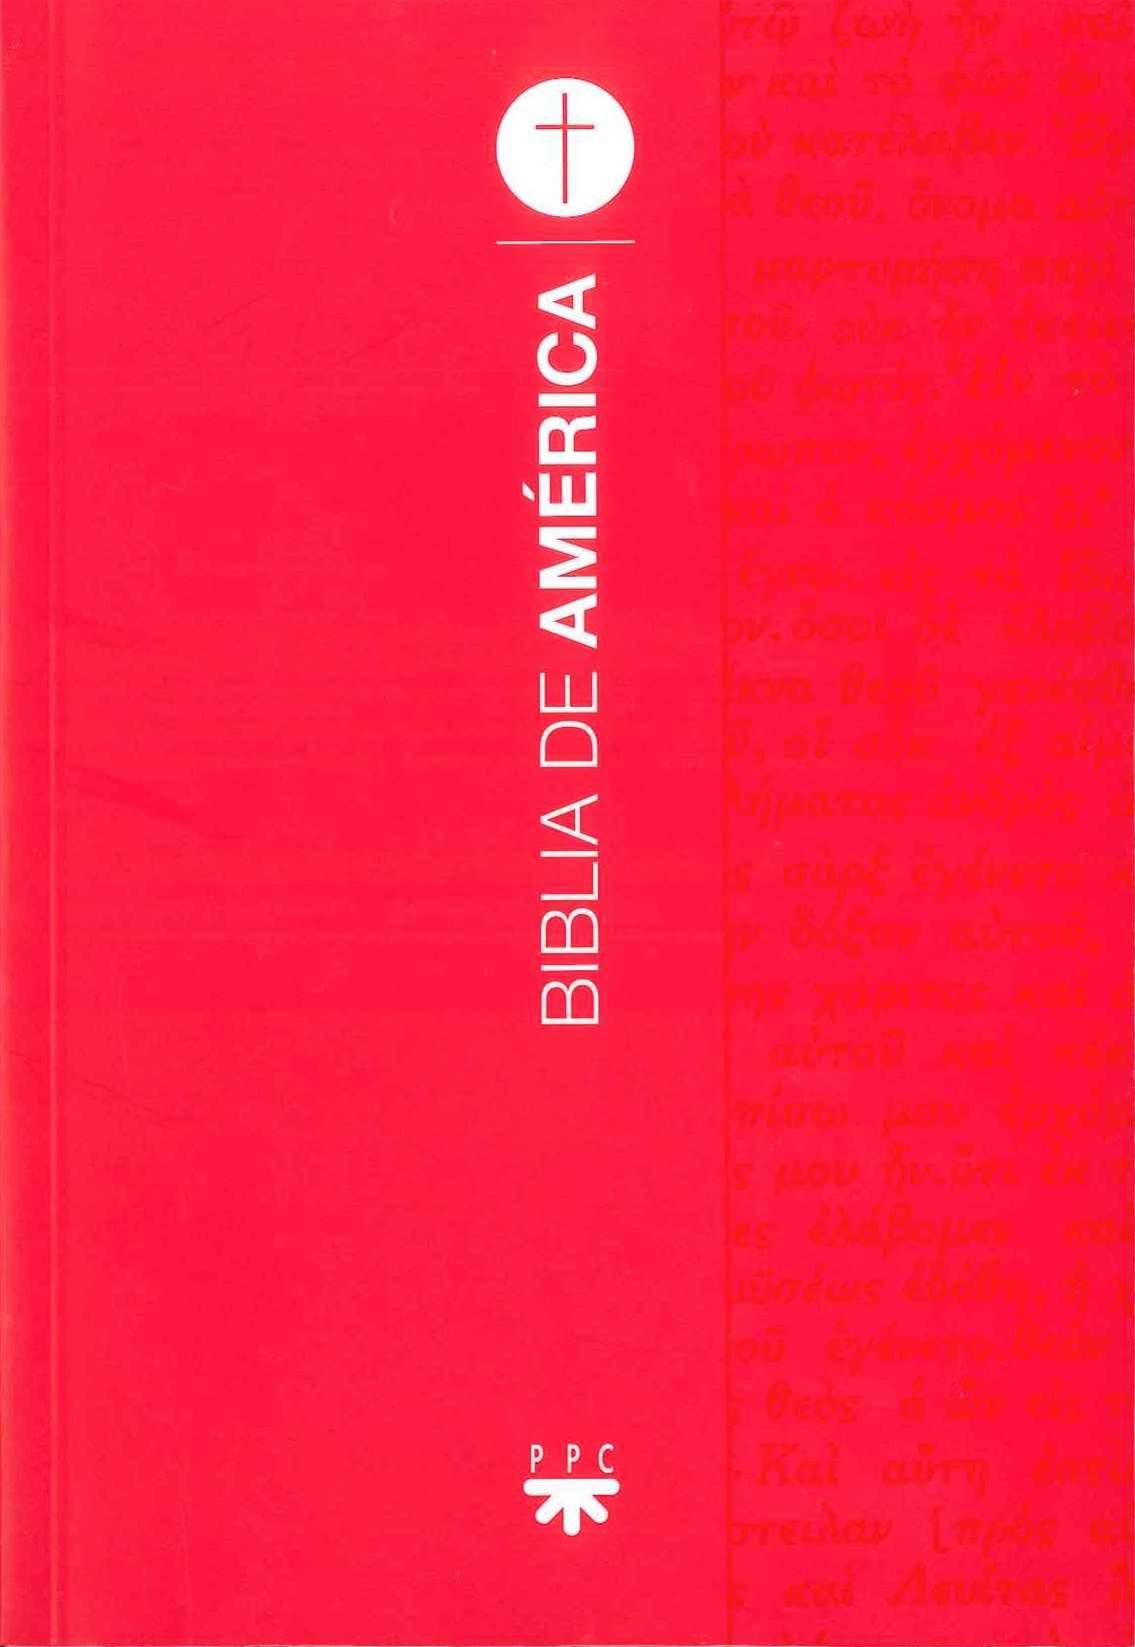 Biblia de América. Manual [Rústica, Roja]